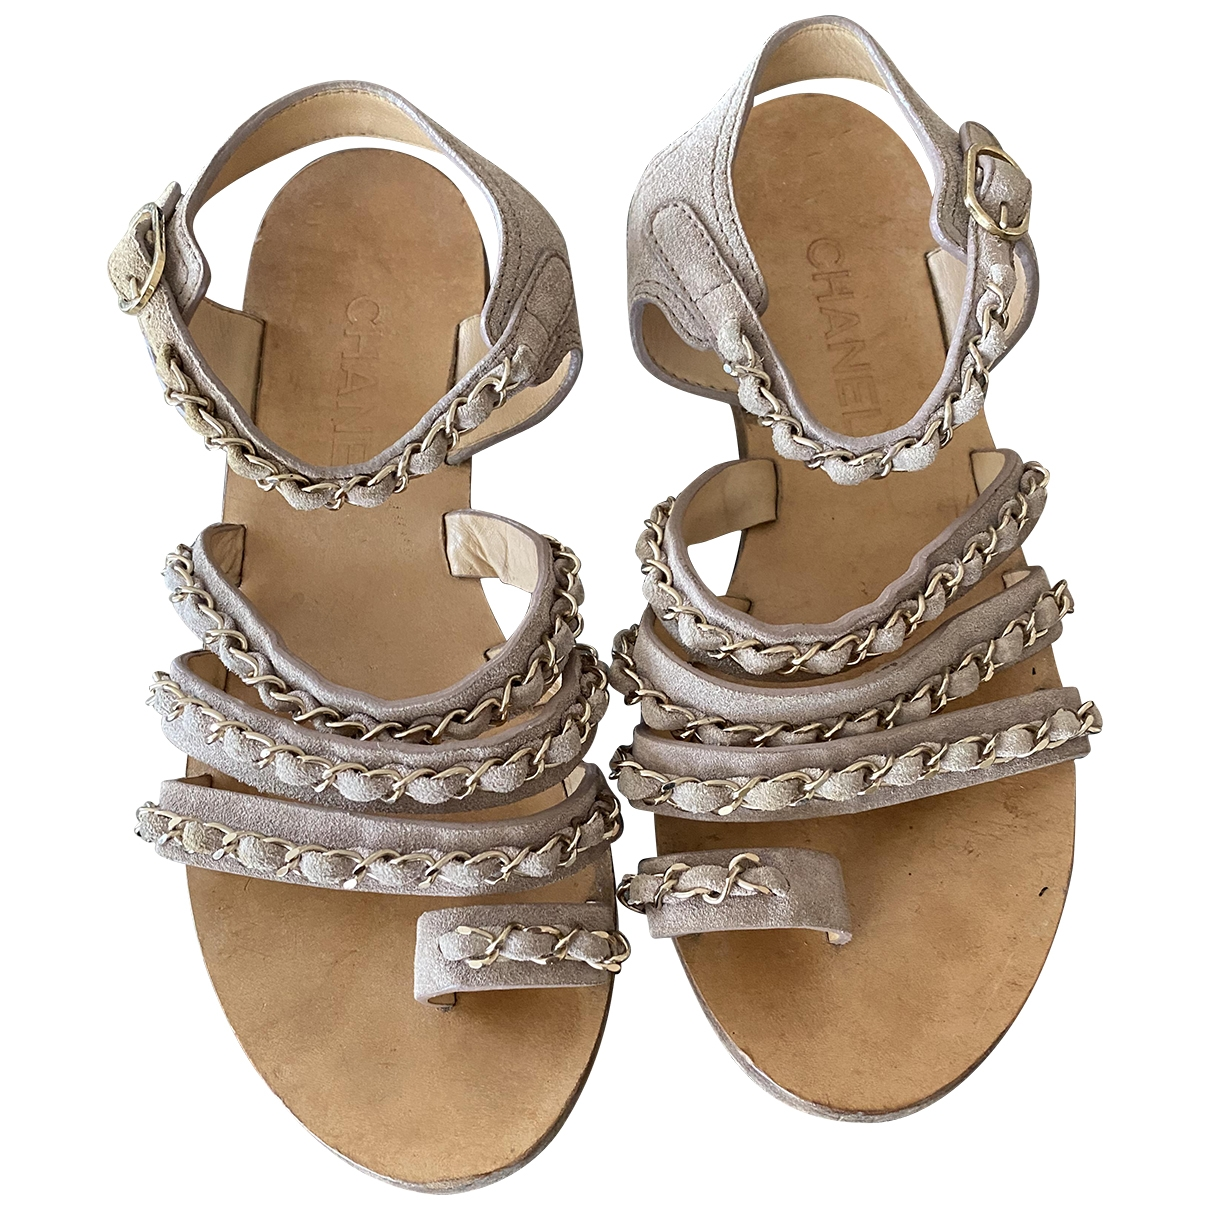 Chanel \N Beige Suede Sandals for Women 38.5 EU